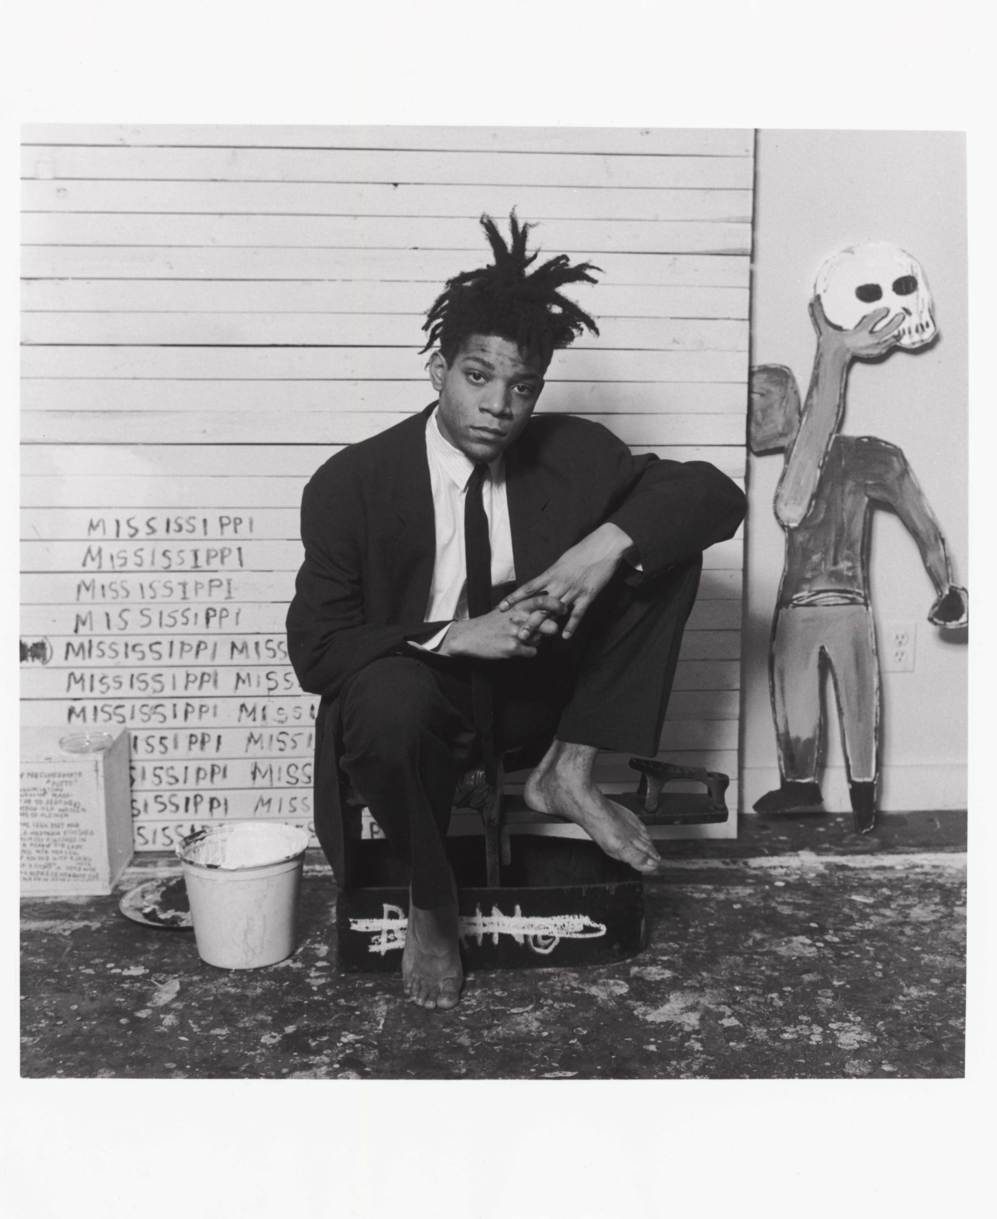 El artista Jean-Michel Basquiat.